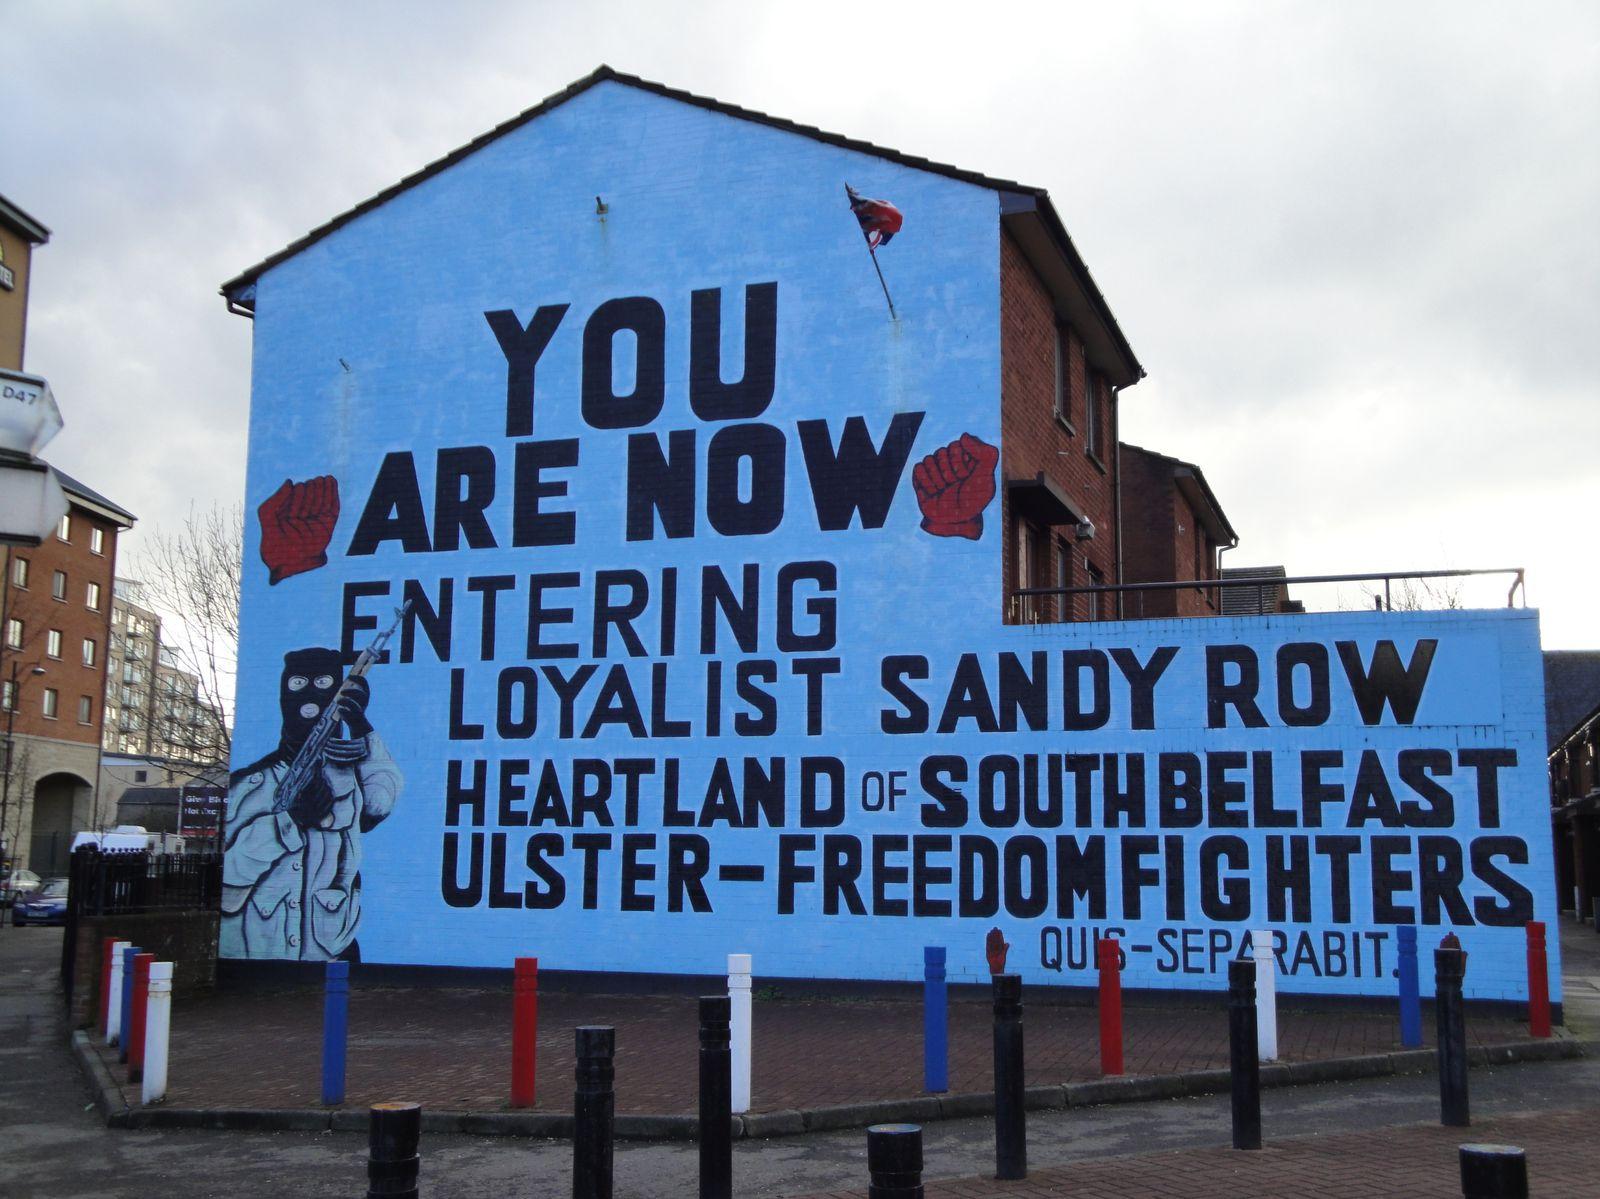 444) Sandy Row, South Belfast